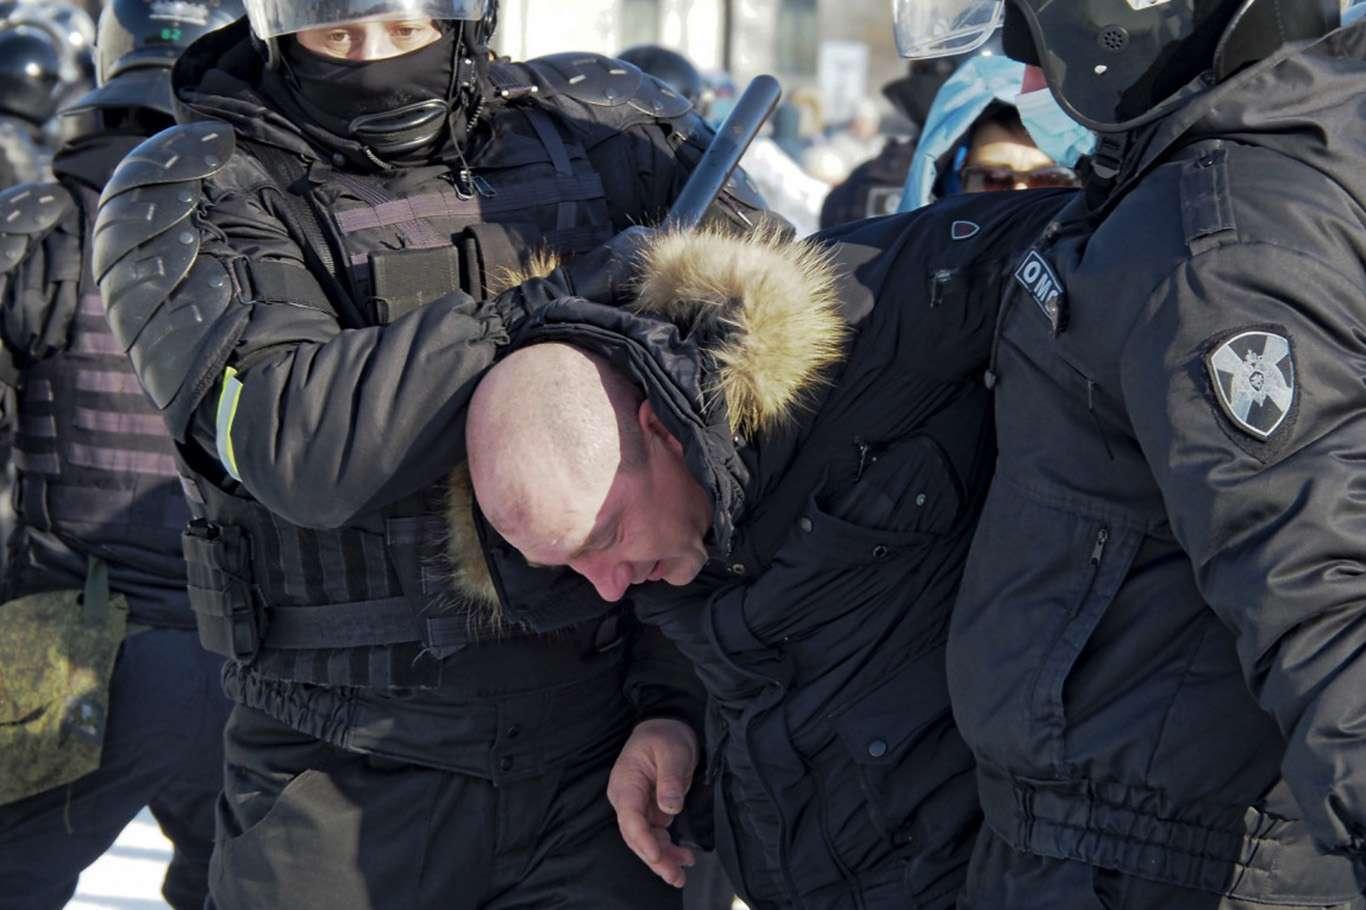 Son Dakika: Rusya 3 Diplomatı Sınır Dışı Etti